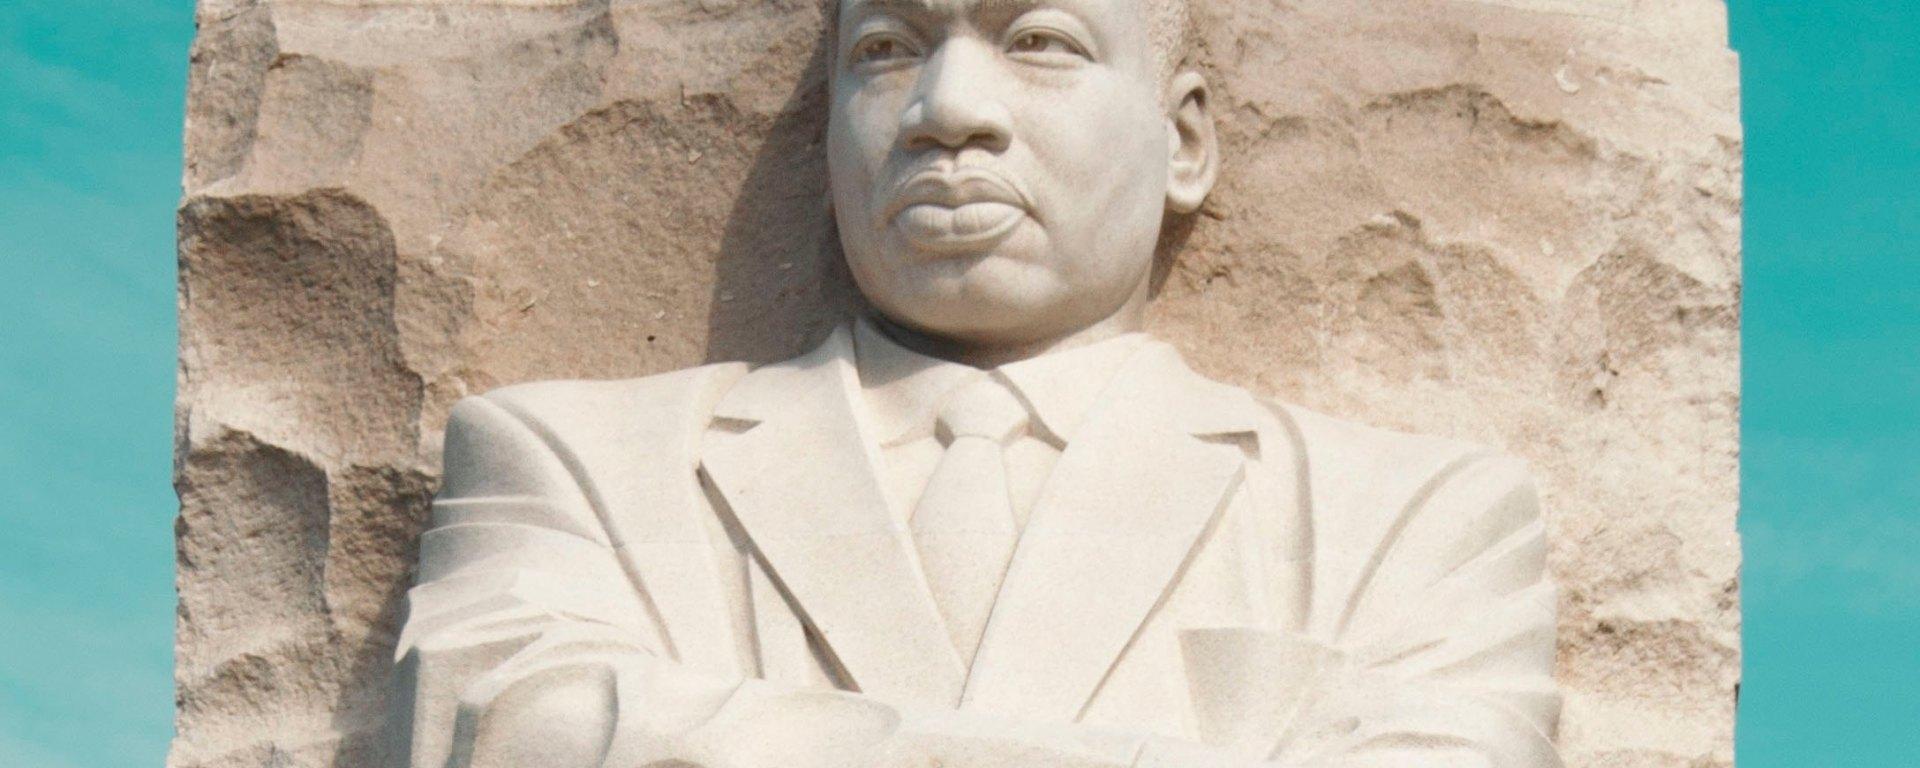 MLK, racism